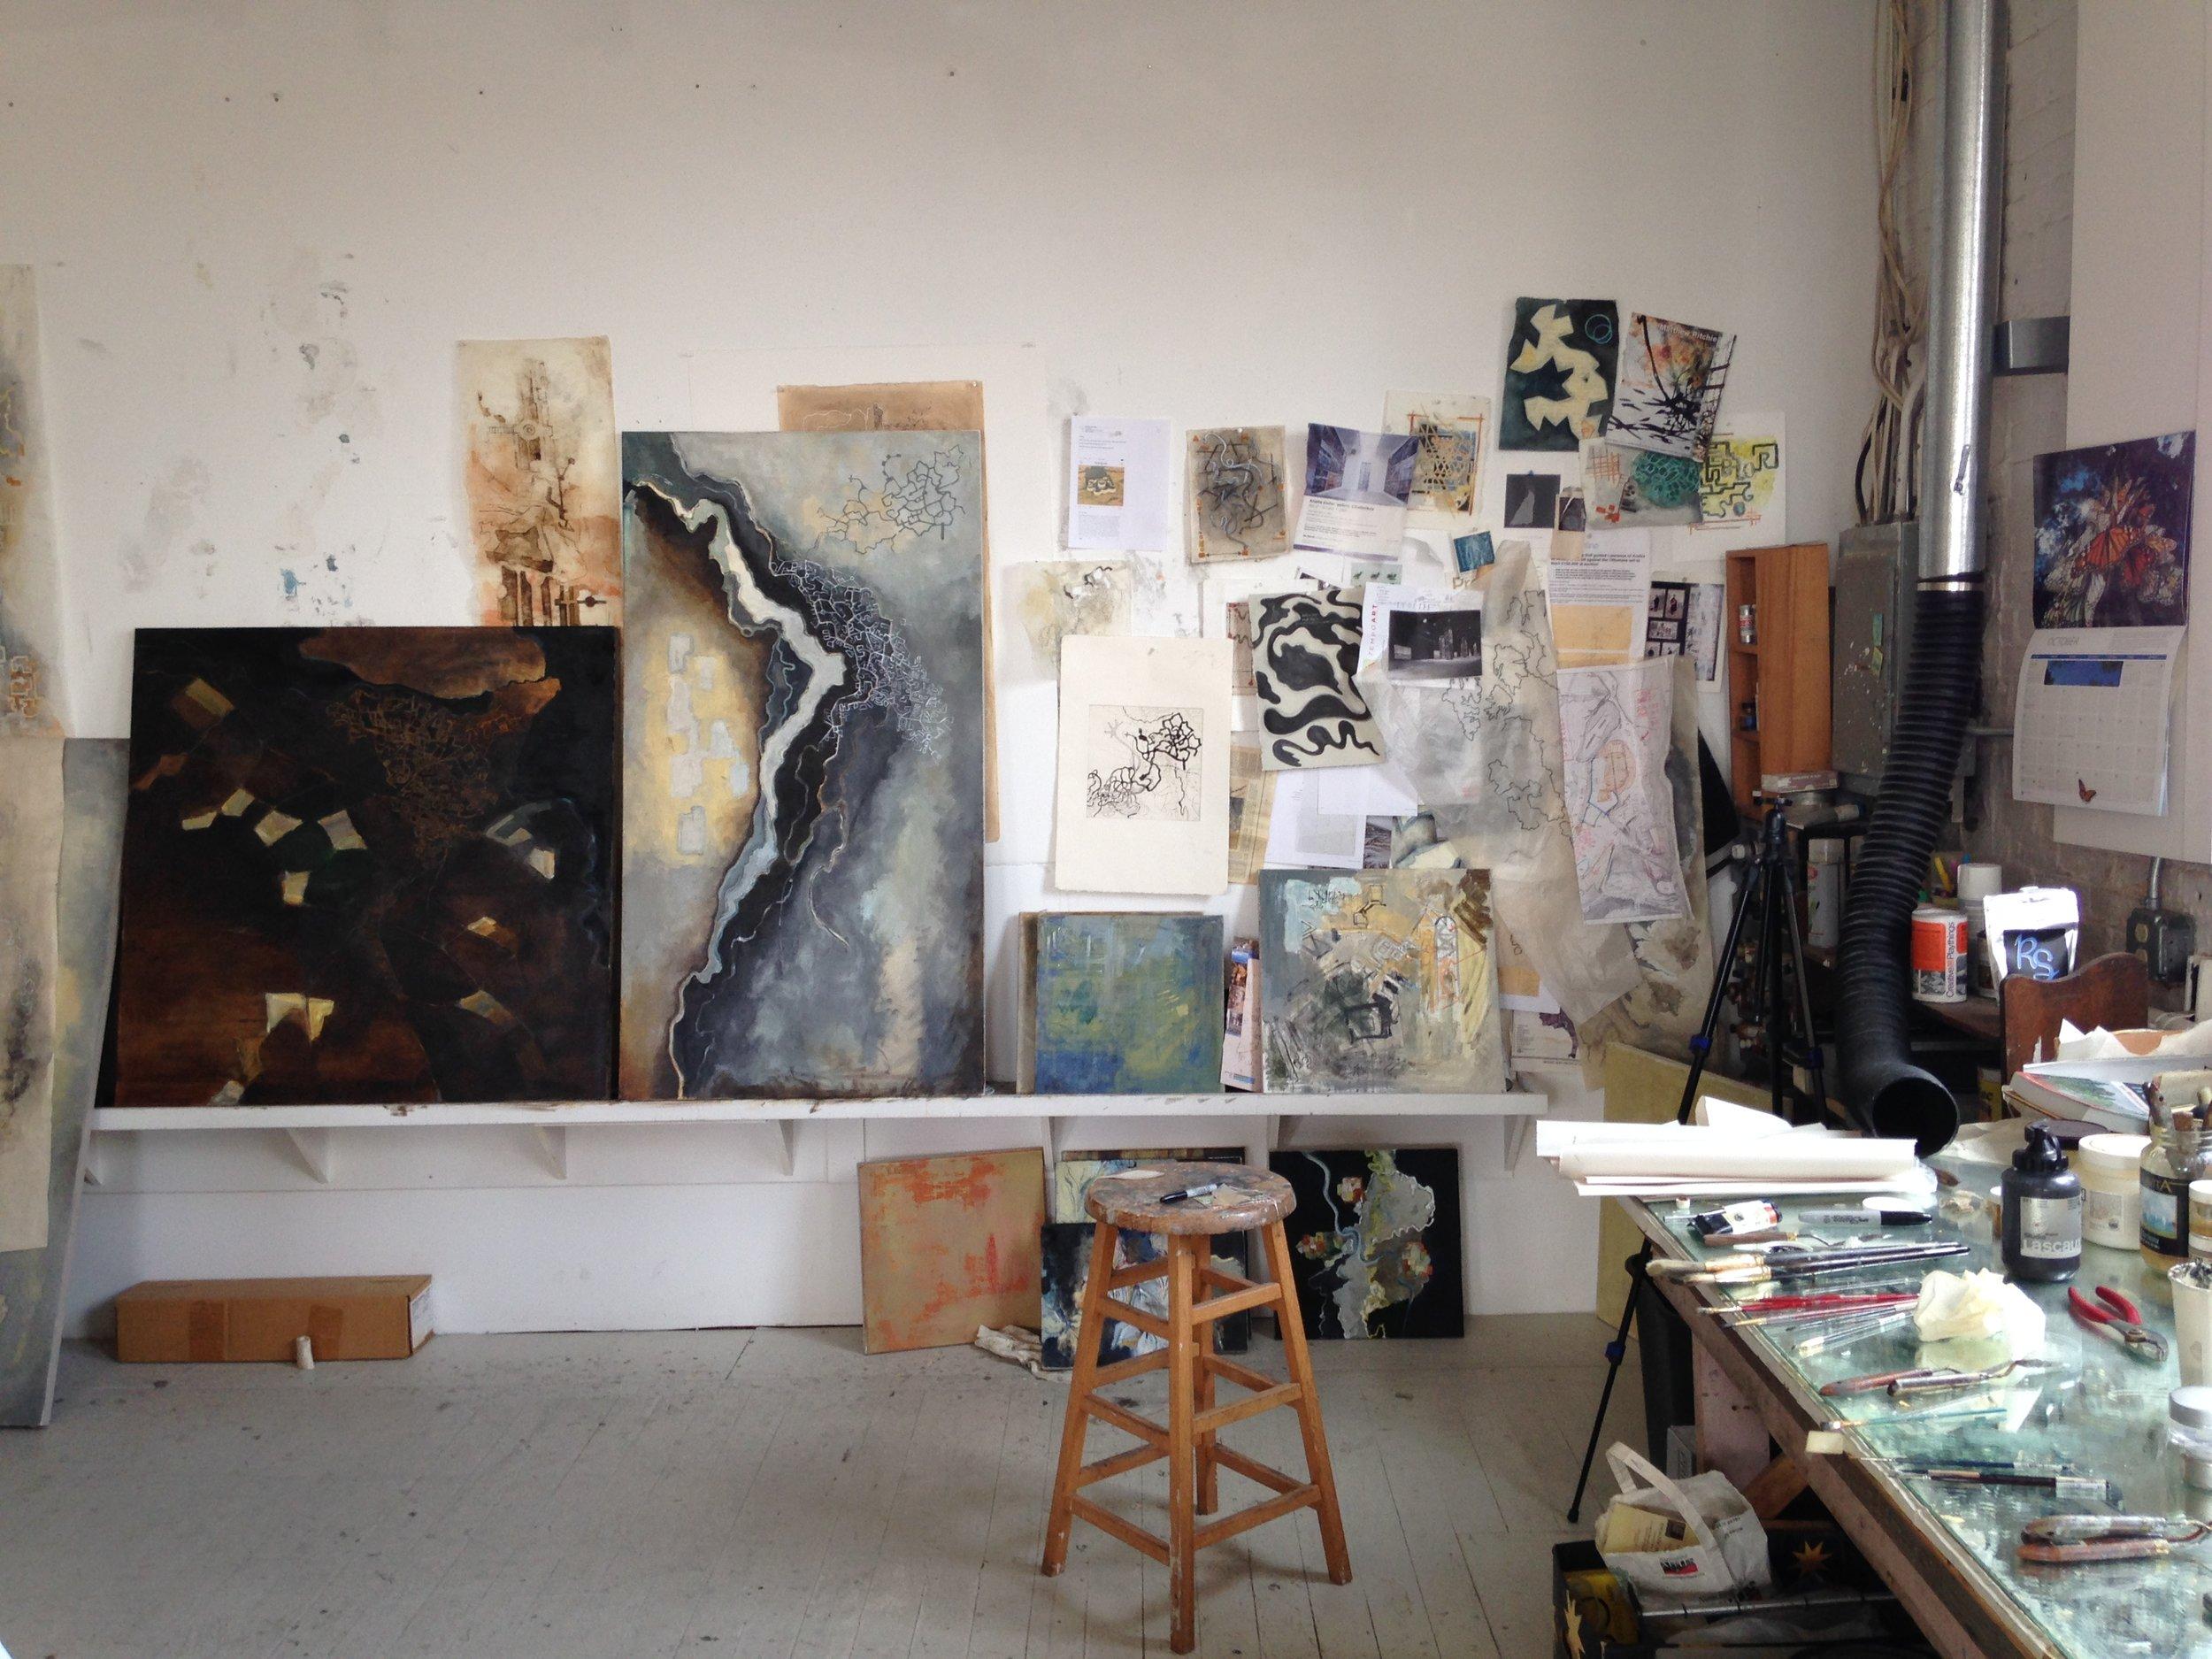 Works in progress at Alison Hildreth's studio in Portland. Photo by Rachael M Rollson